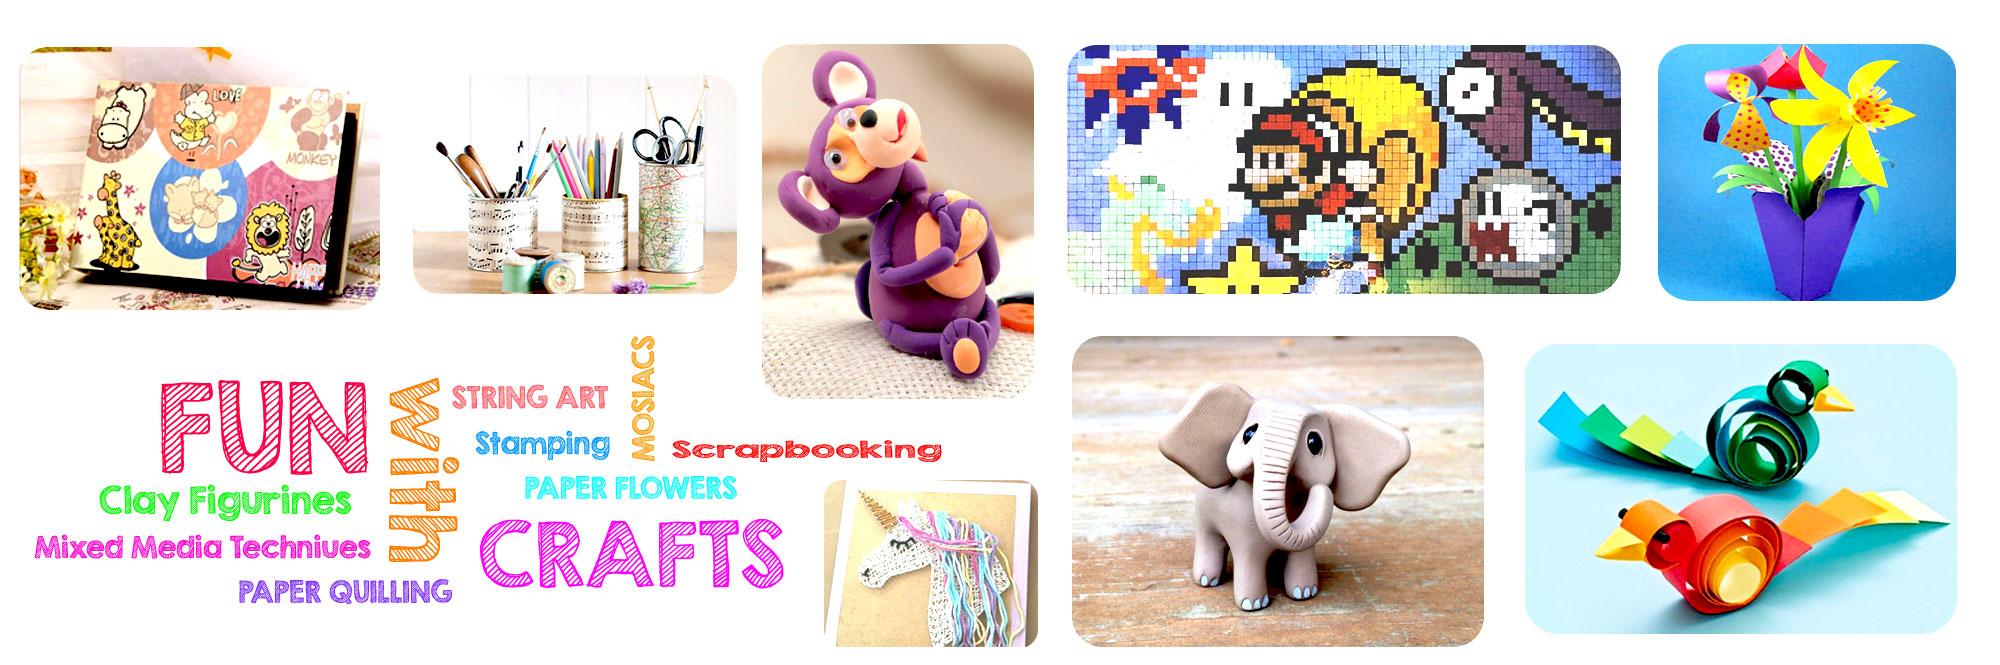 fun-with-crafts-2.jpg